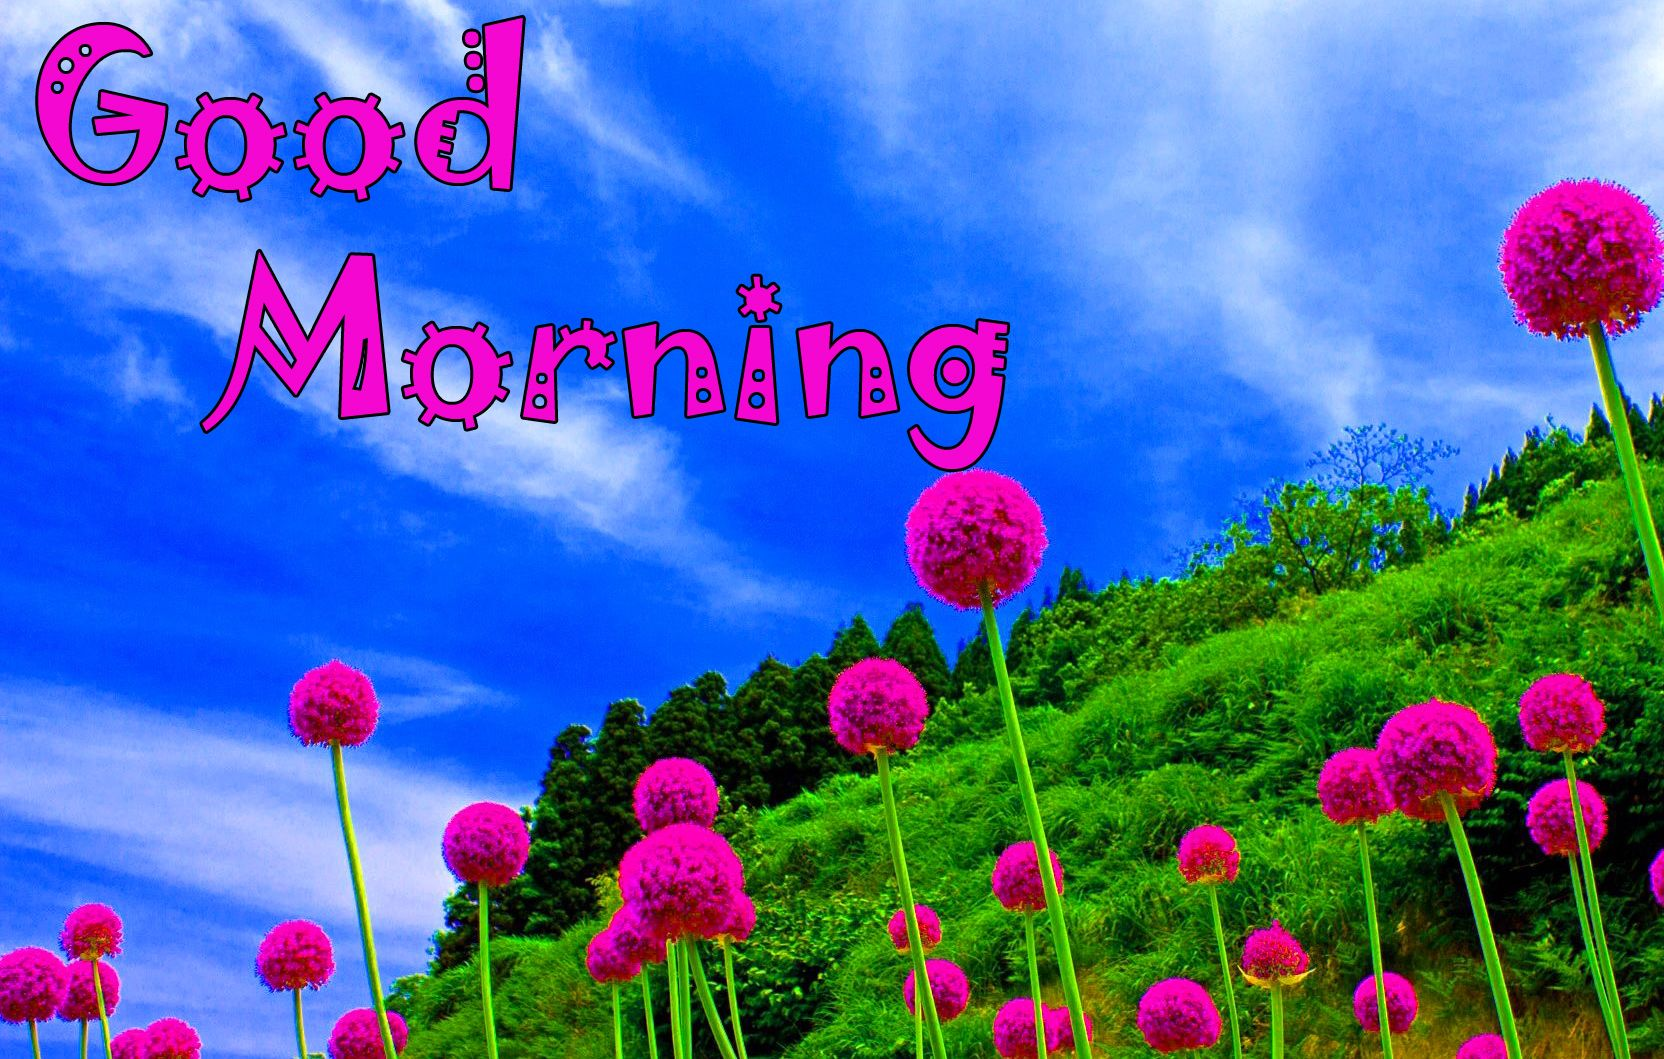 1194 Good Morning Images Hd Wallpaper Pics For Whatsapp Good Morning Images Good Morning Wallpaper Good Morning Photos